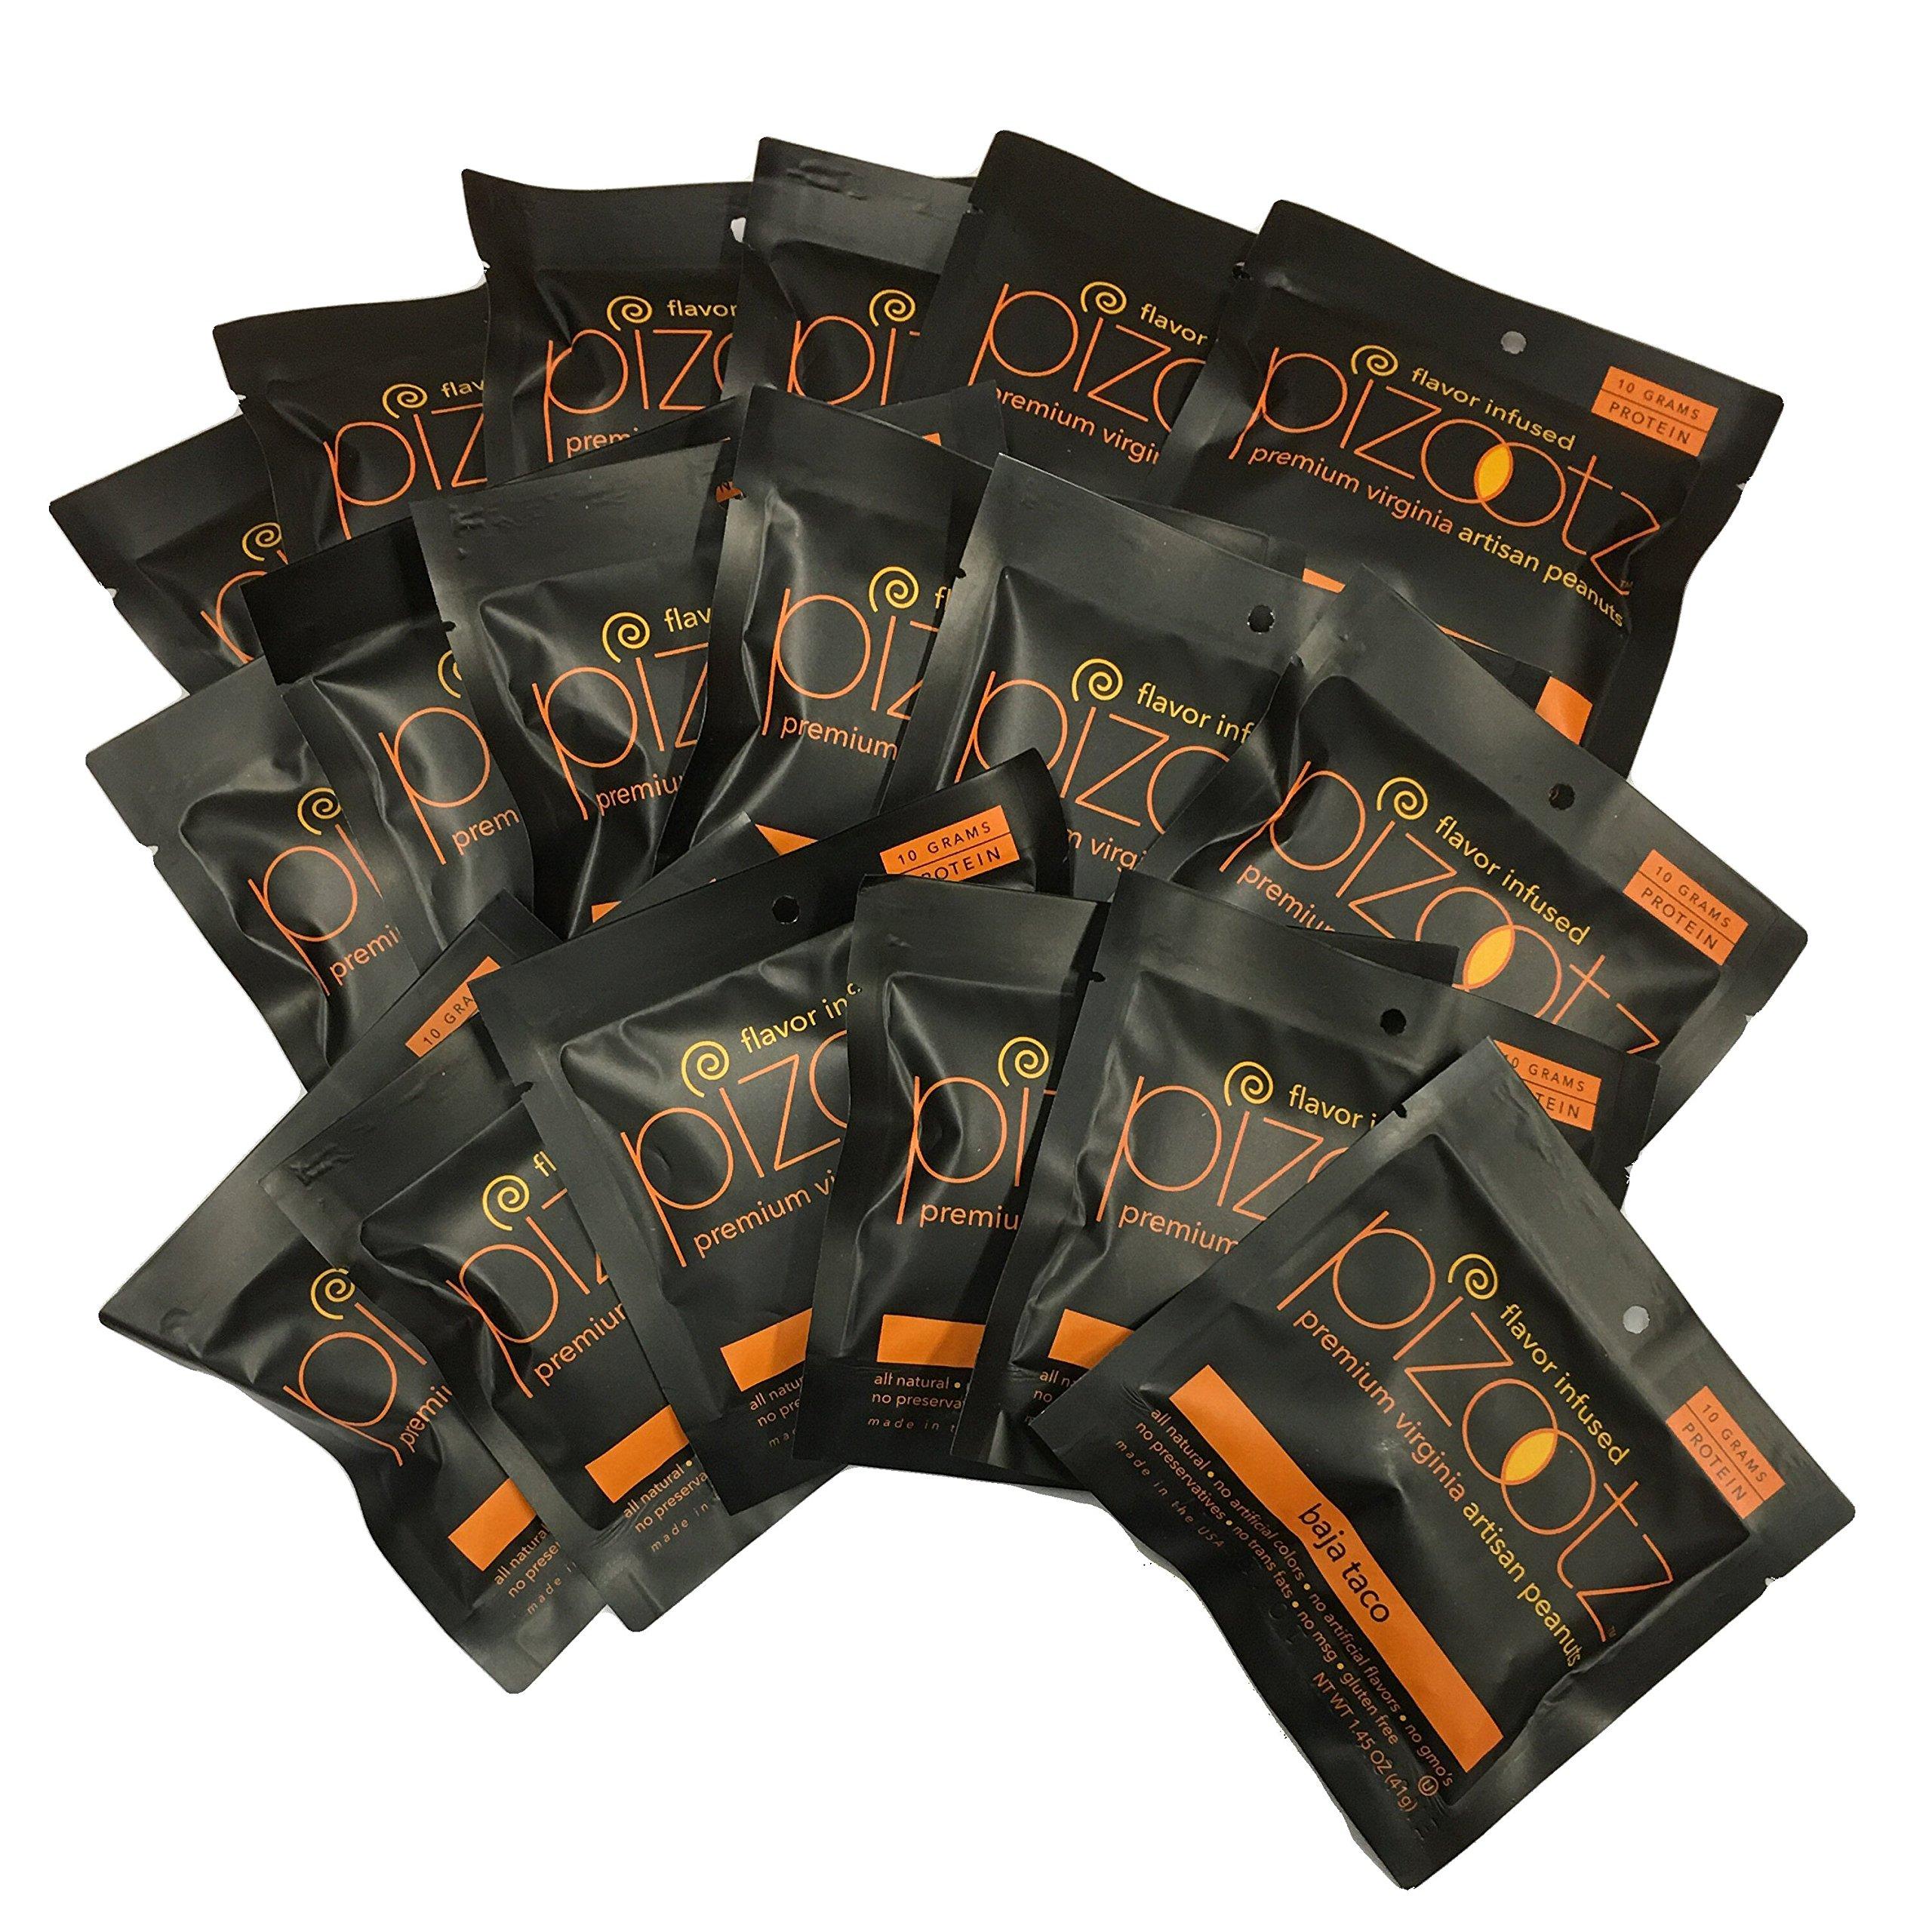 Pizootz Value Pack-Baja Taco Flavor Infused Peanuts-Premium Virginia Gourmet Artisan Vegan Peanuts - (18) 1.45 oz bags